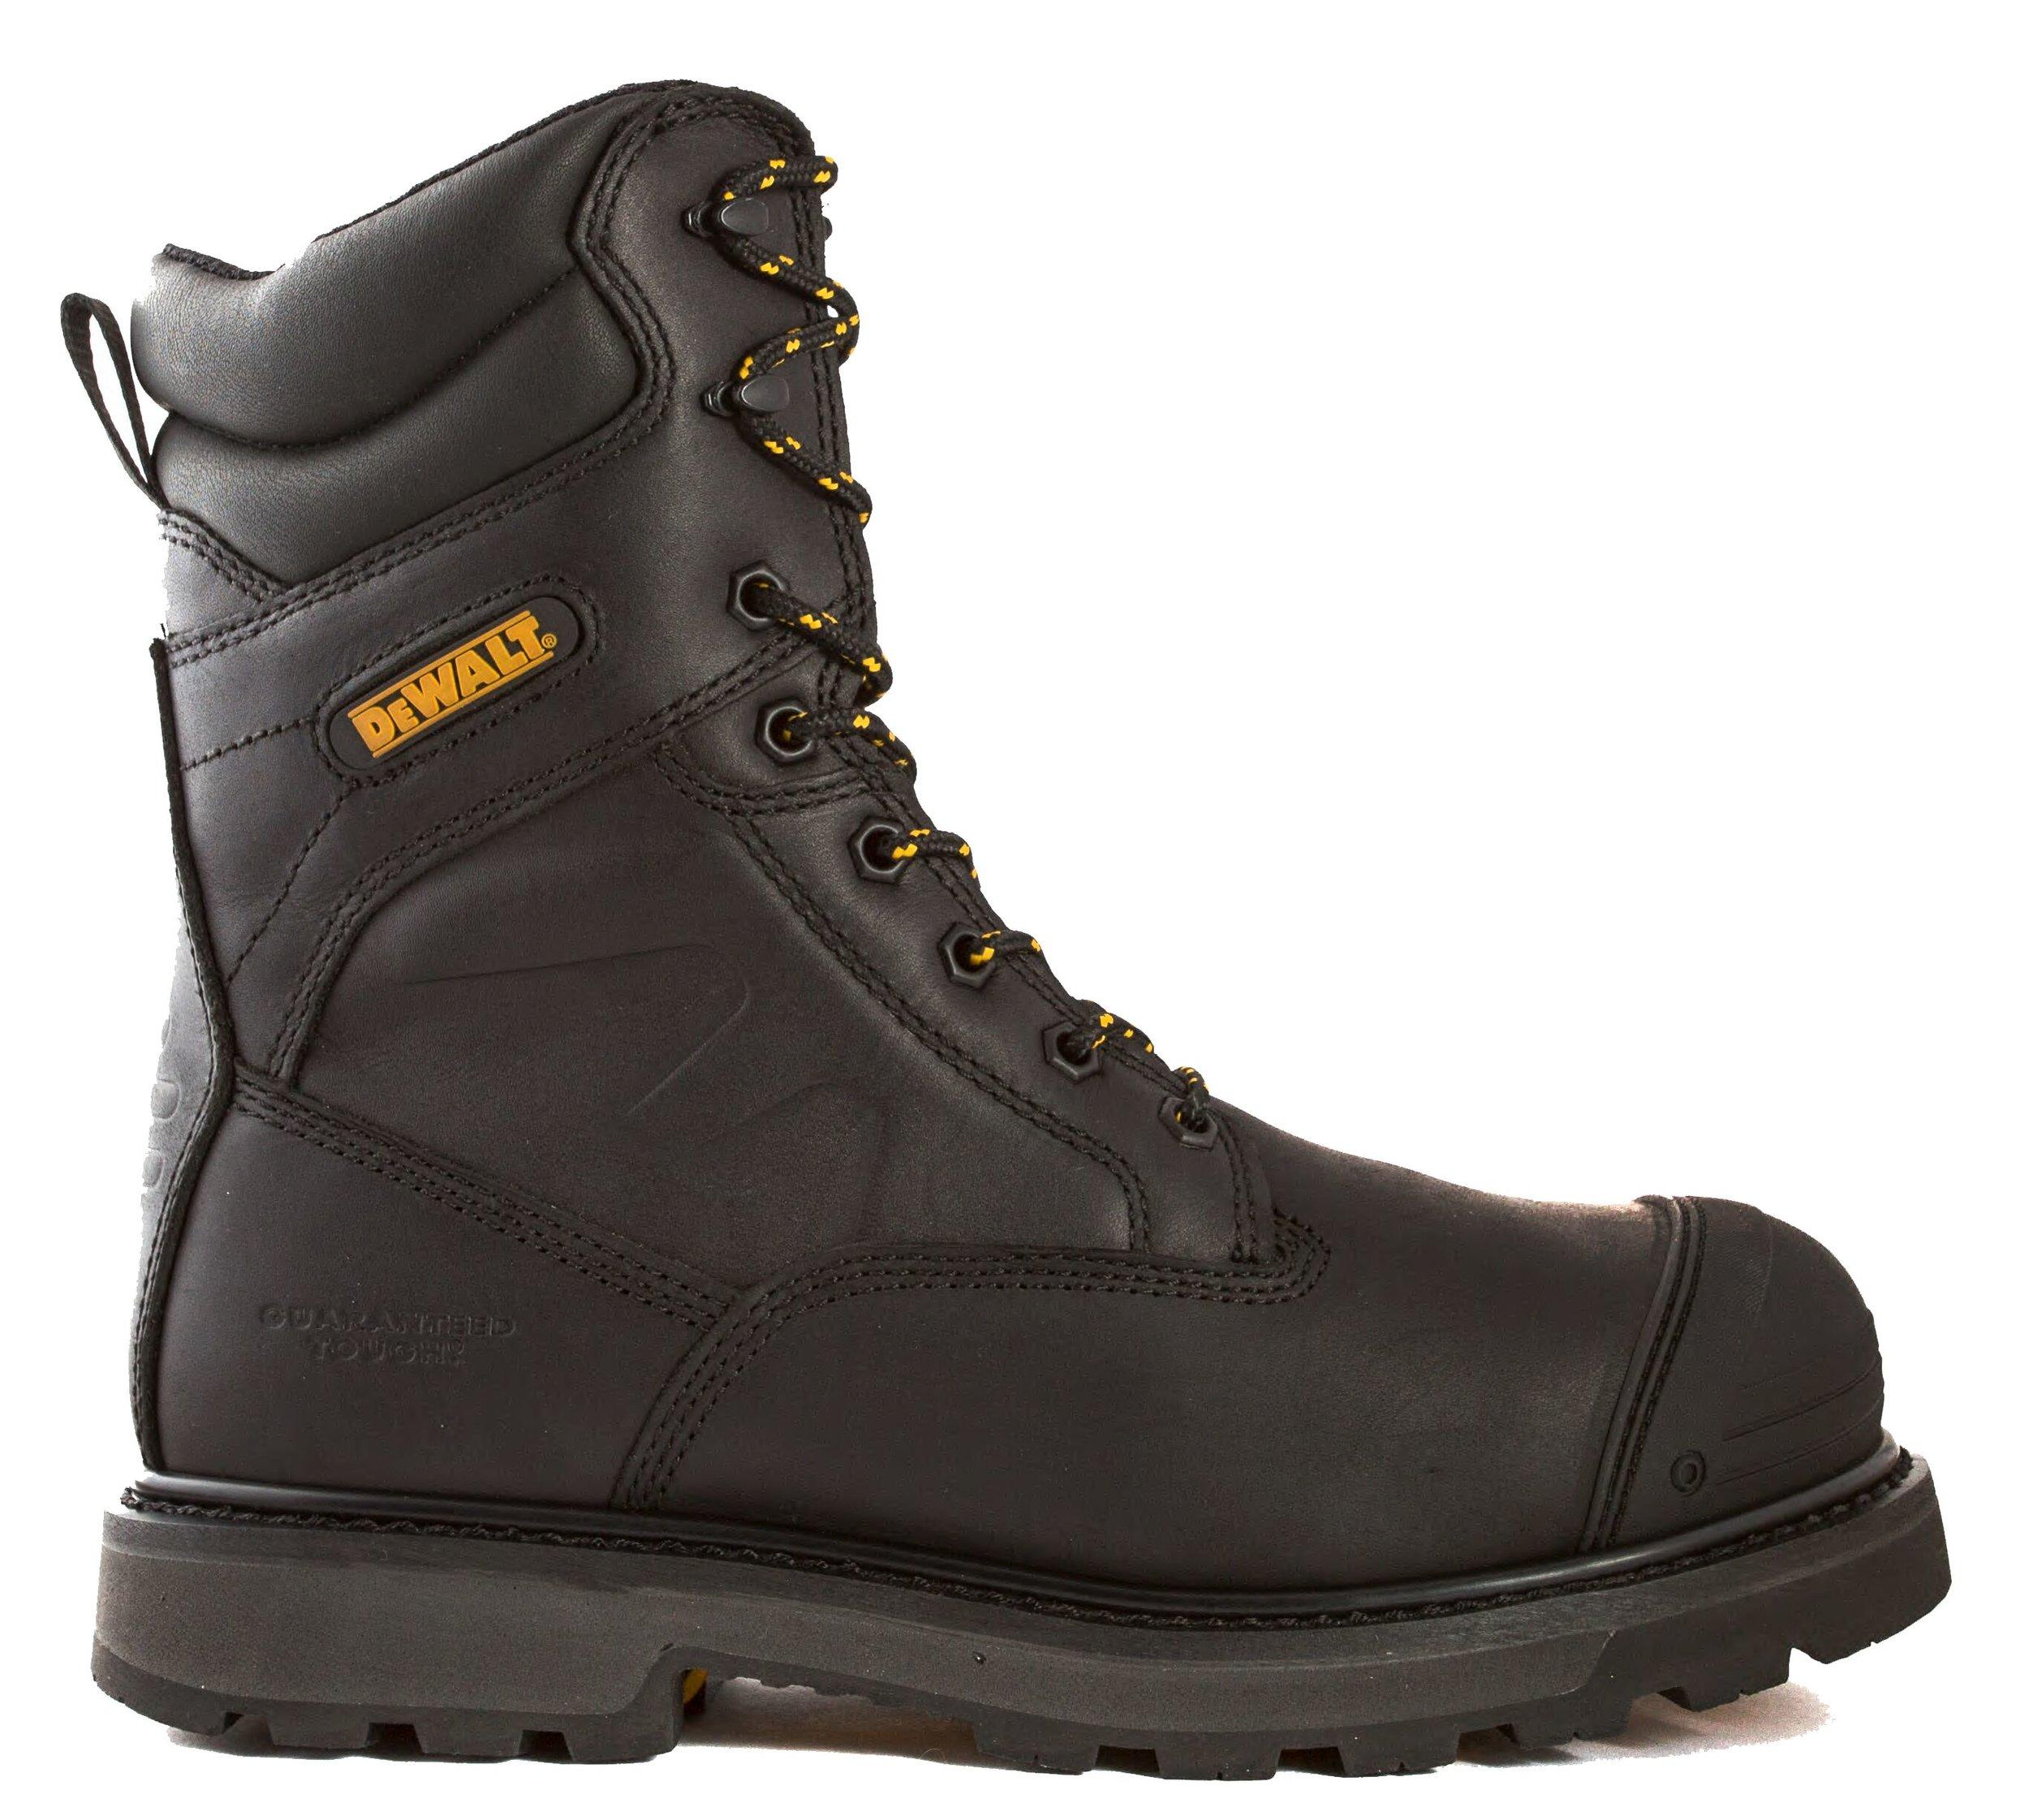 Boot 1.jpeg